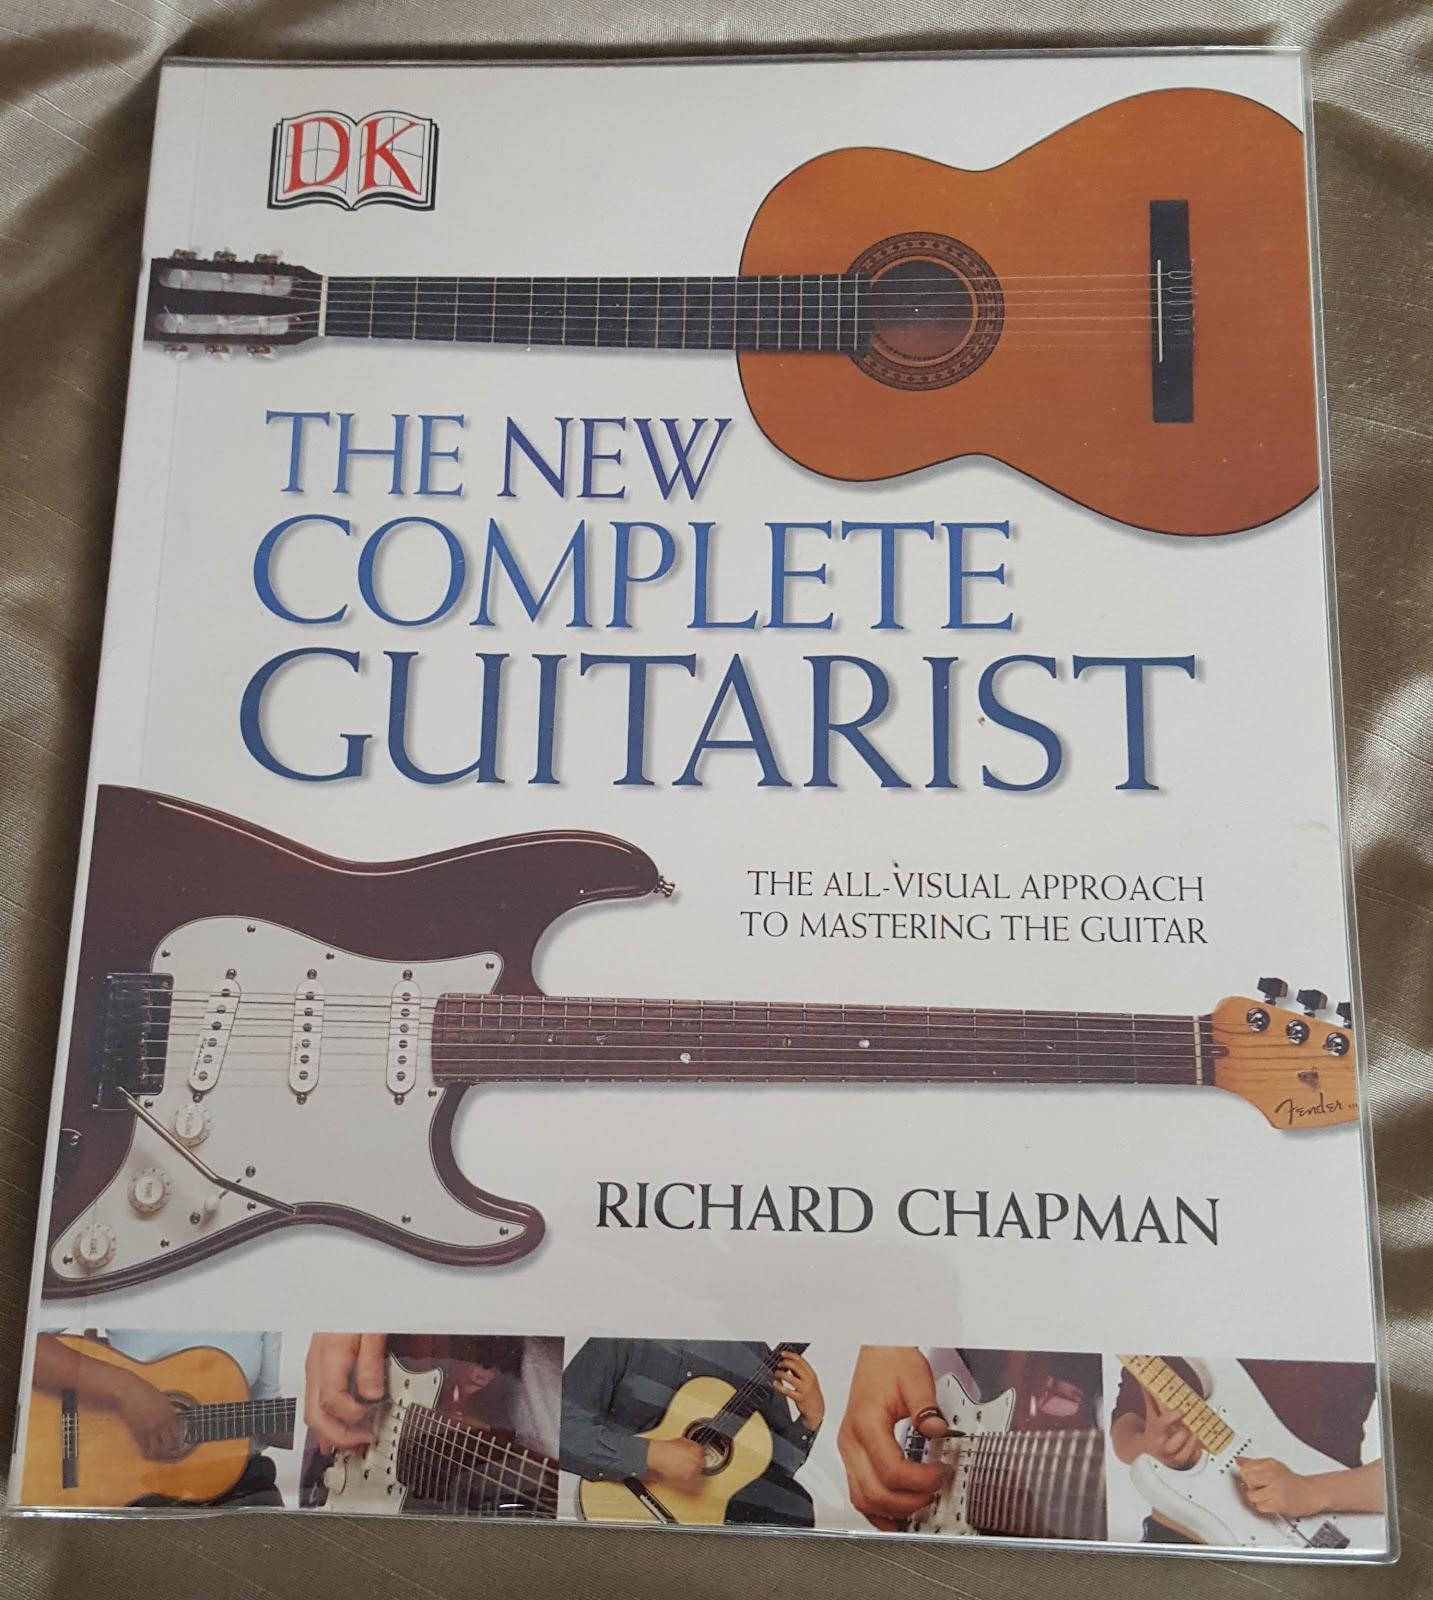 DLP Guitars